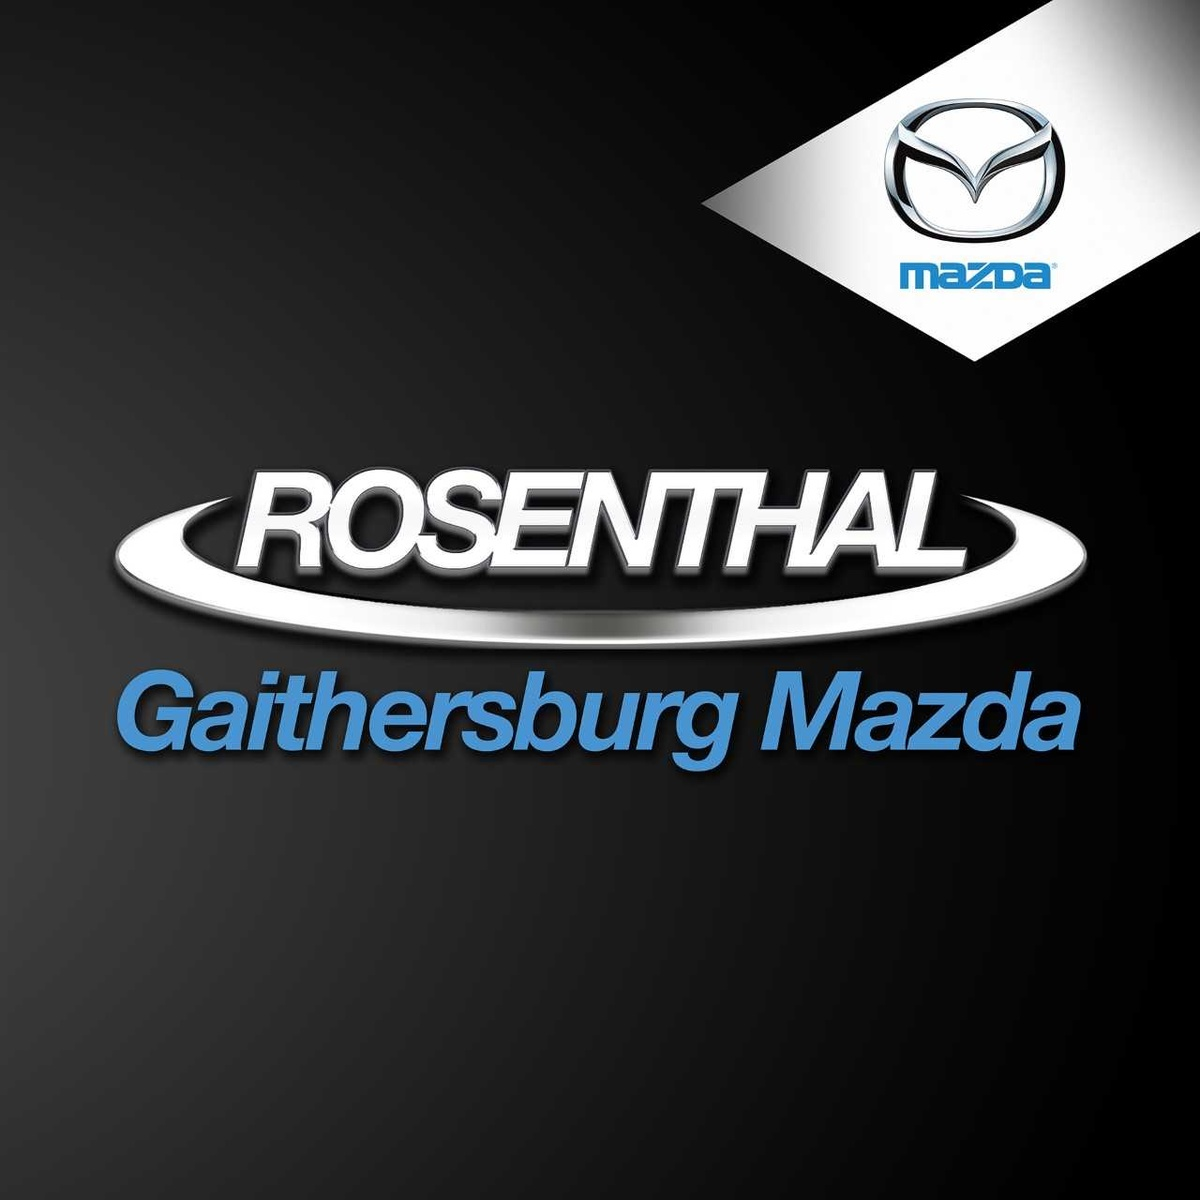 Mazda Dealers Maryland: Rosenthal Gaithersburg Mazda